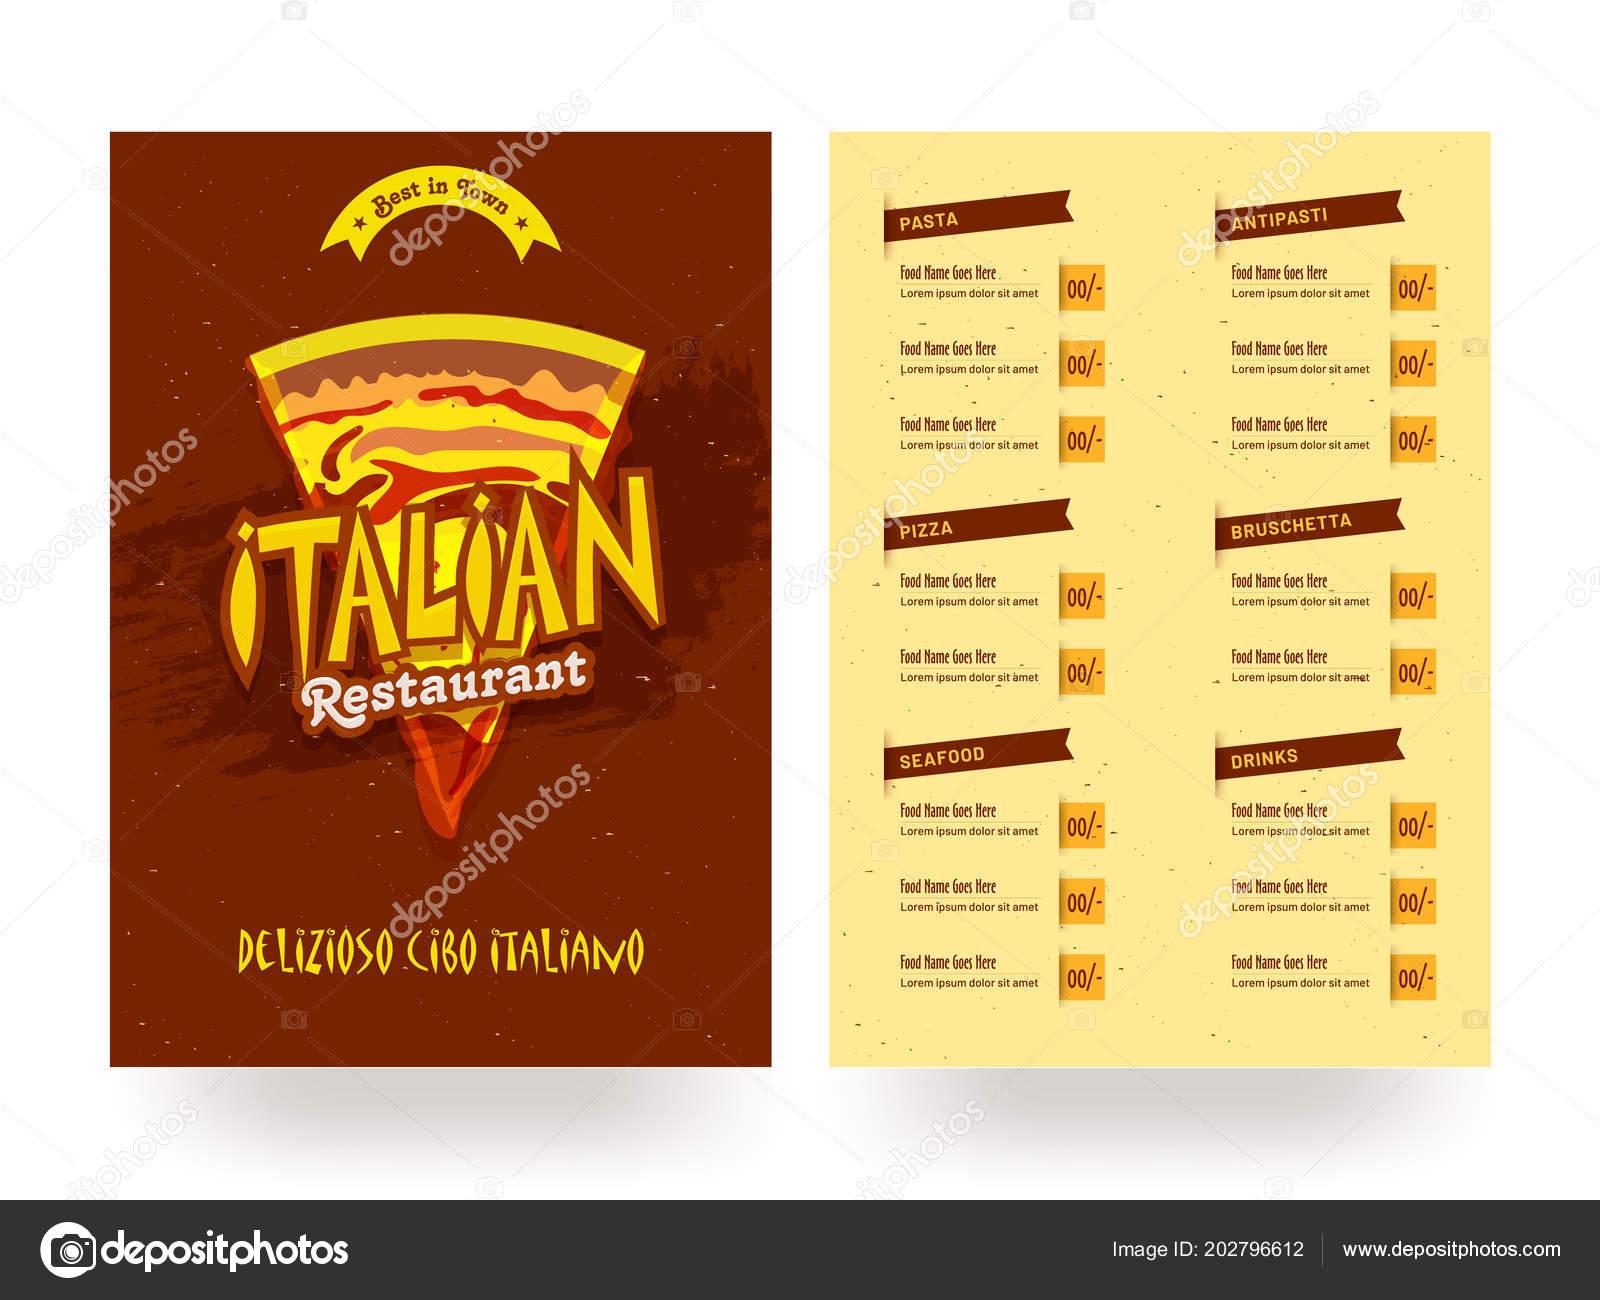 Menu Card Design For Hotel Italian Restaurant Menu Card Template Flyer Design Stock Vector C Alliesinteract 202796612